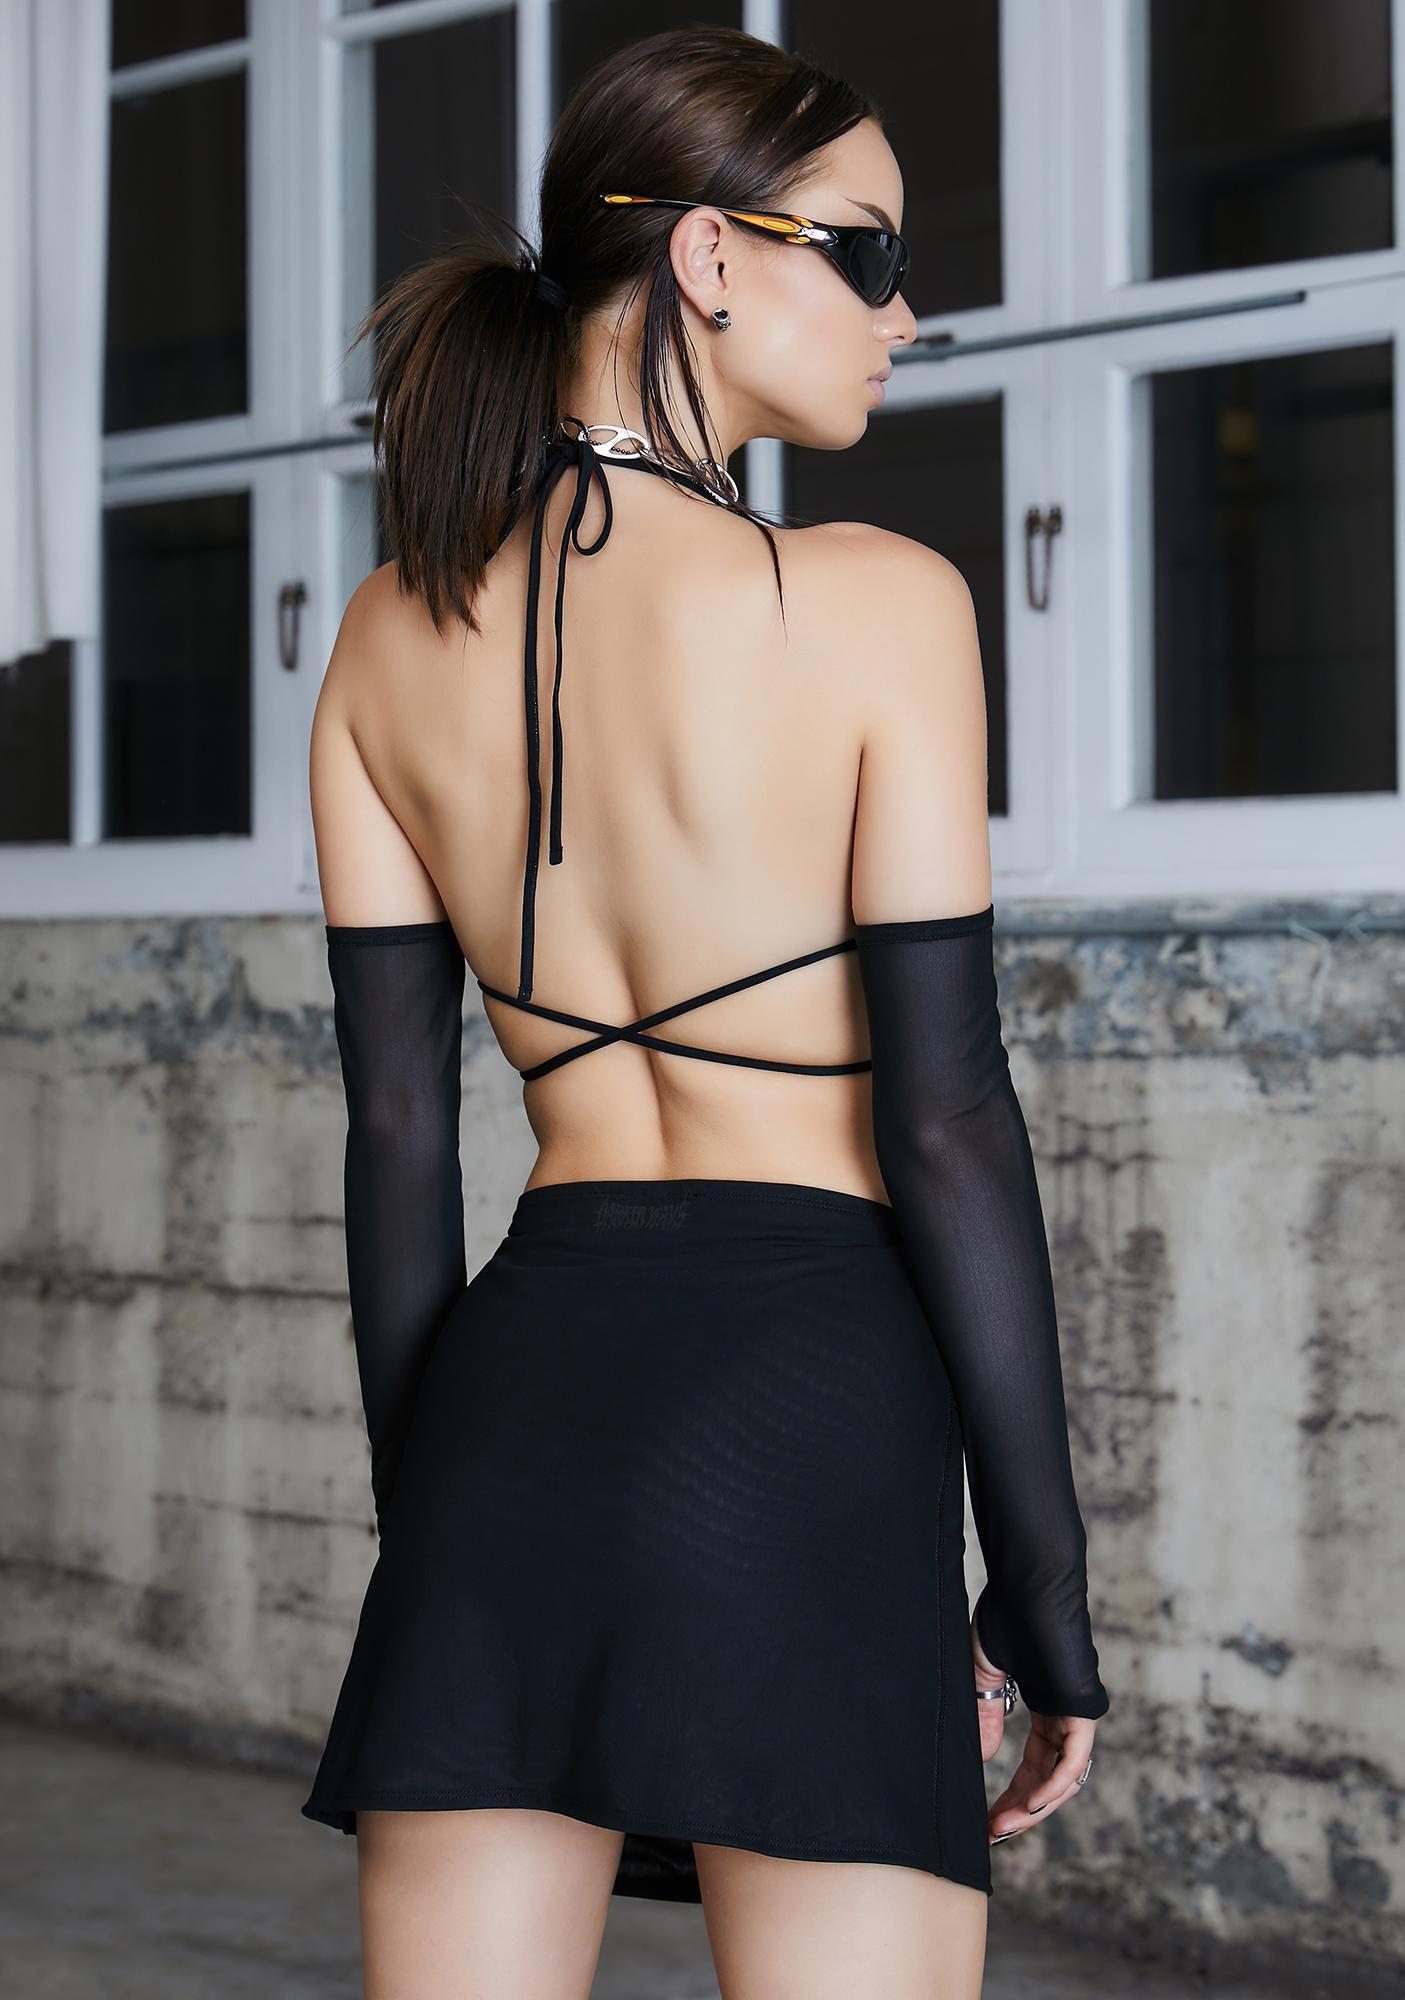 DARKER WAVS Kickdrum Mesh Bra With Gloves And Skirt Set